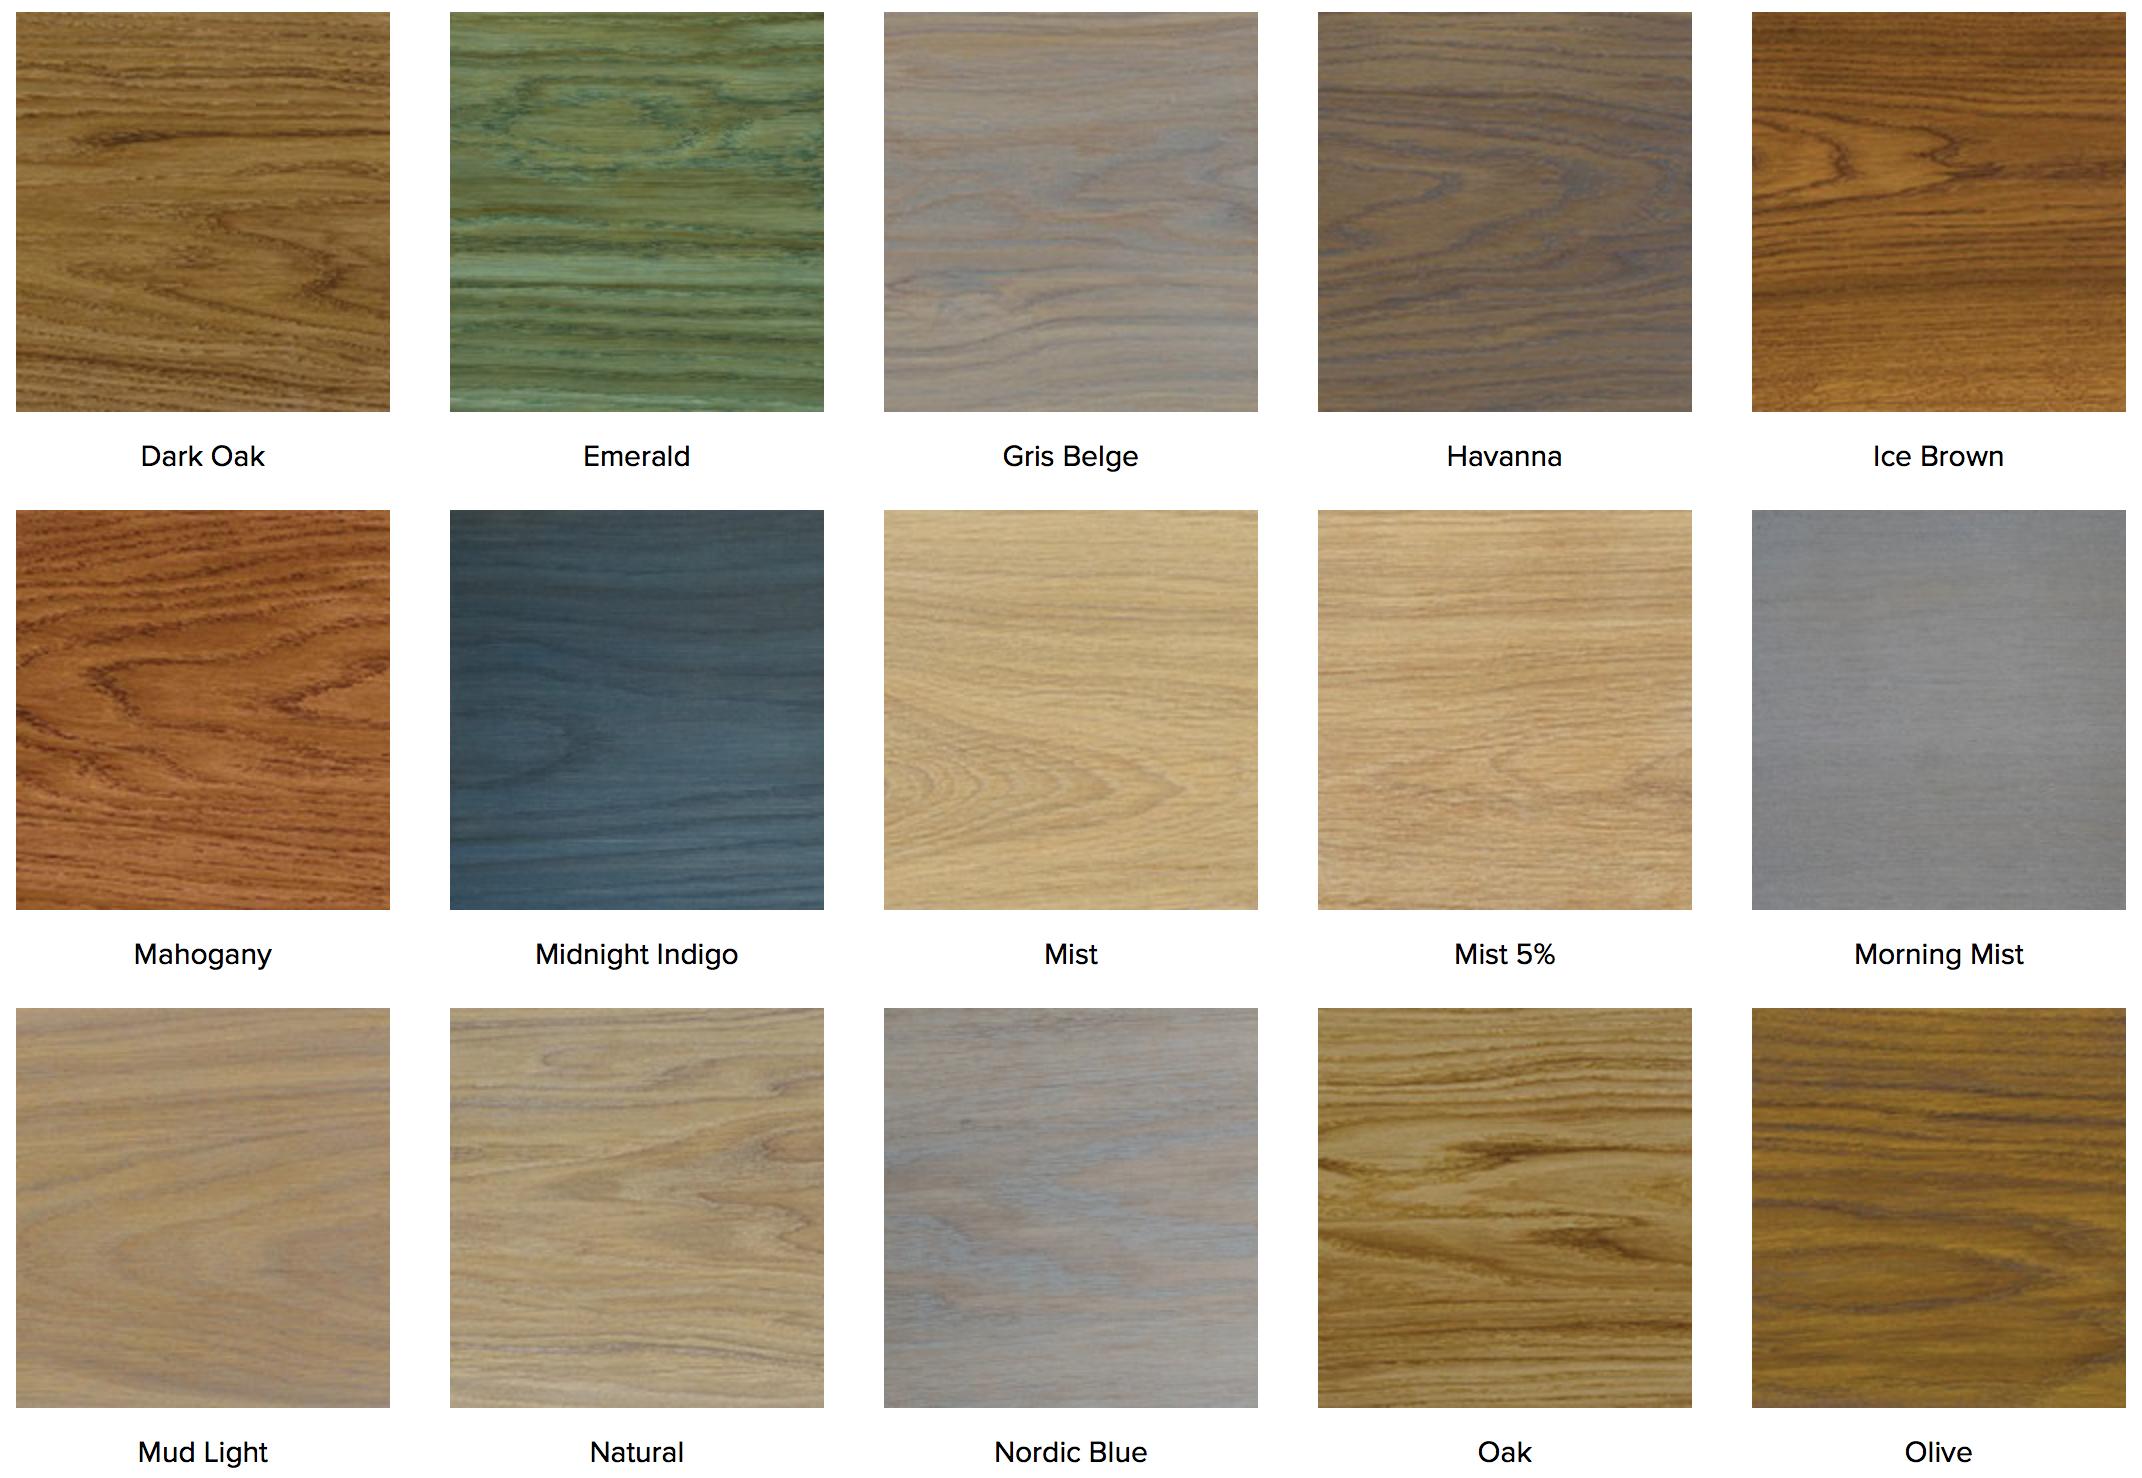 Rubio monocoat plus hardwood flooring screen shot 2017 02 28 at 92248 pmg nvjuhfo Images